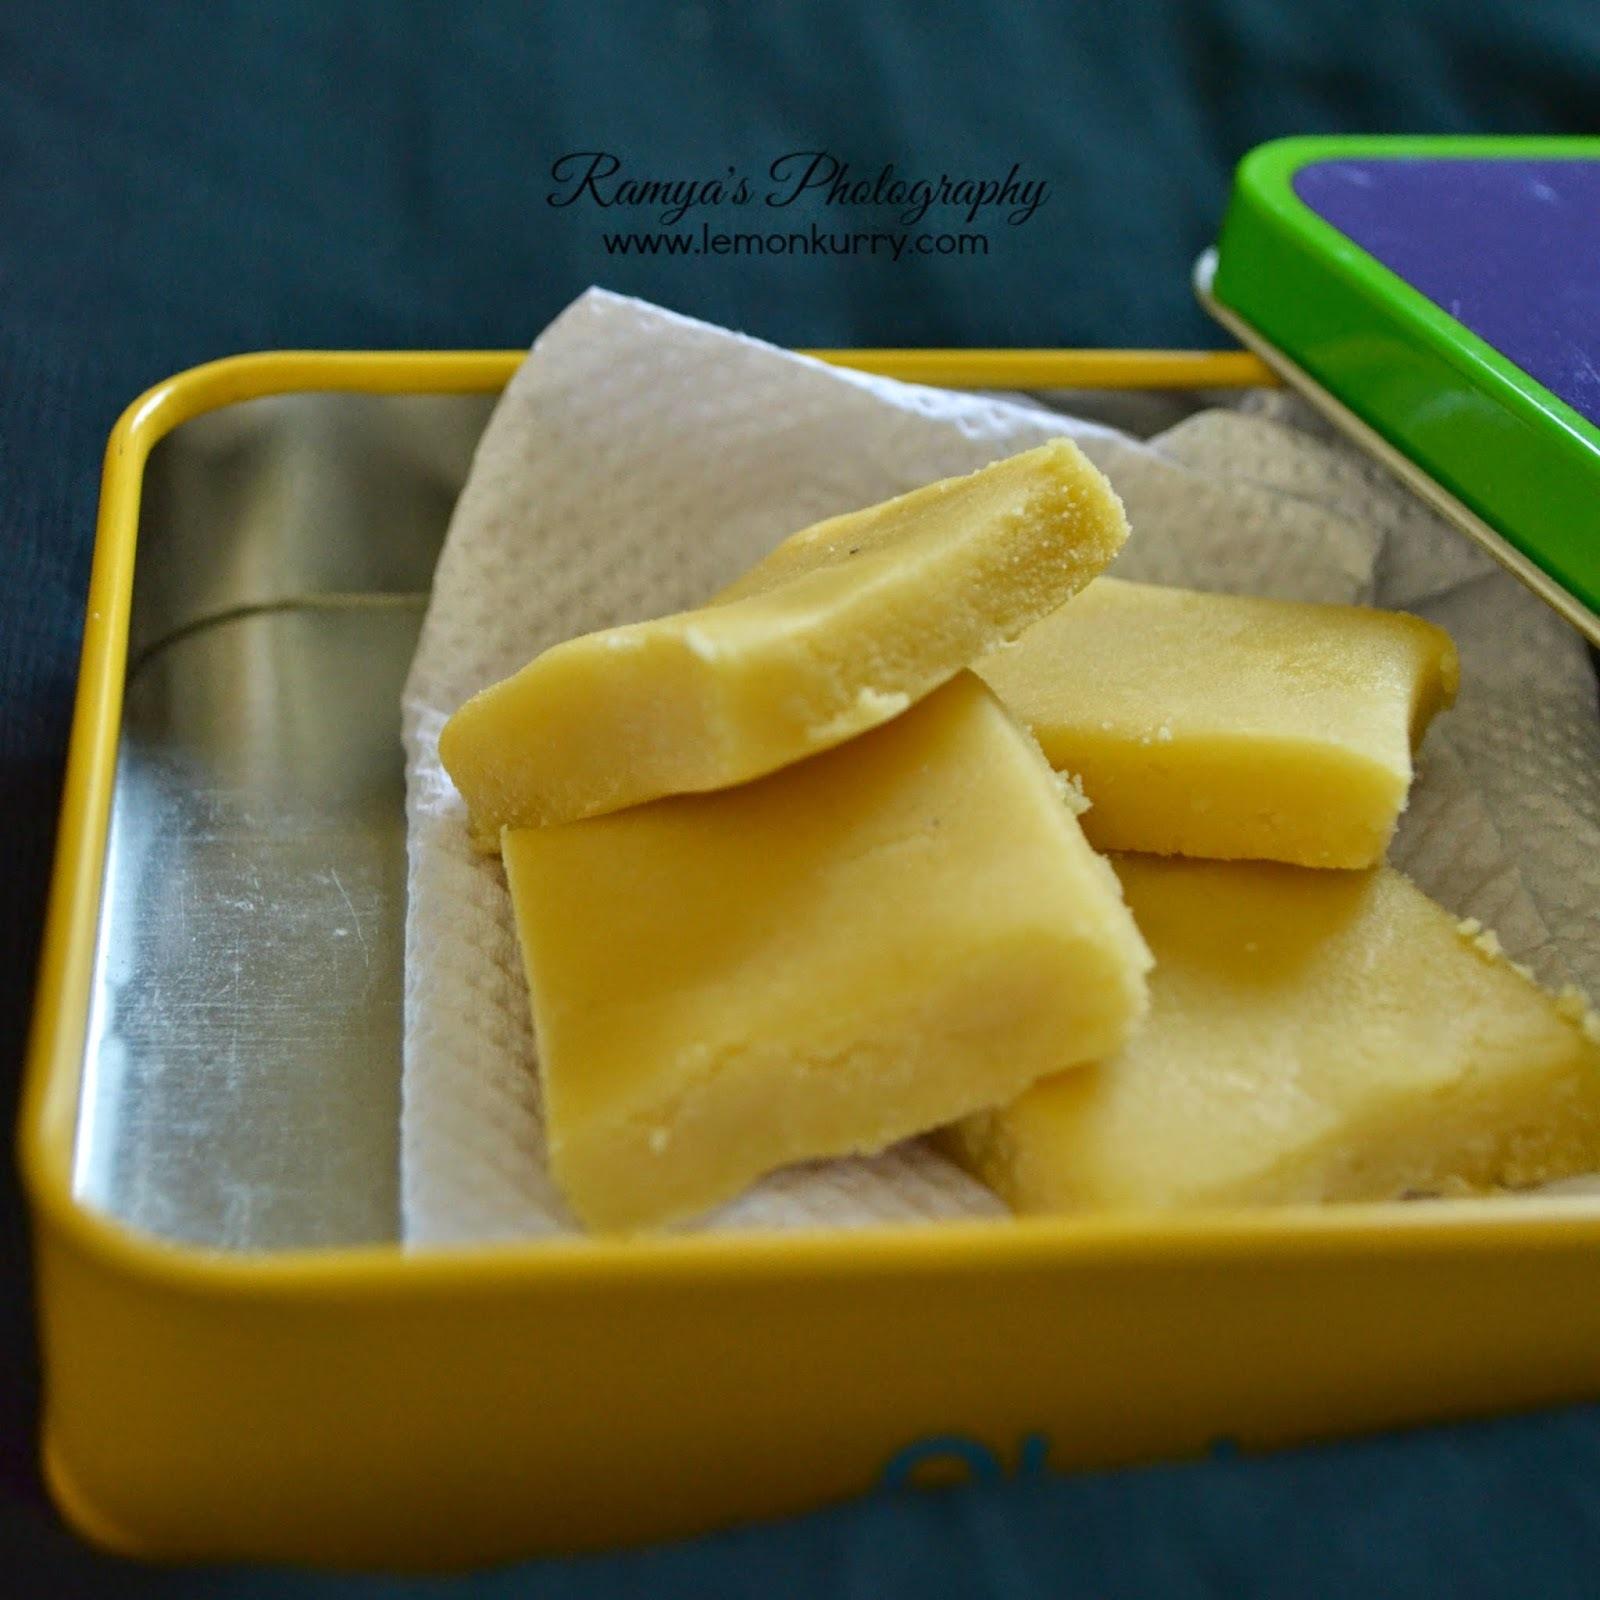 ghee mysore pak - soft mysore pak recipe